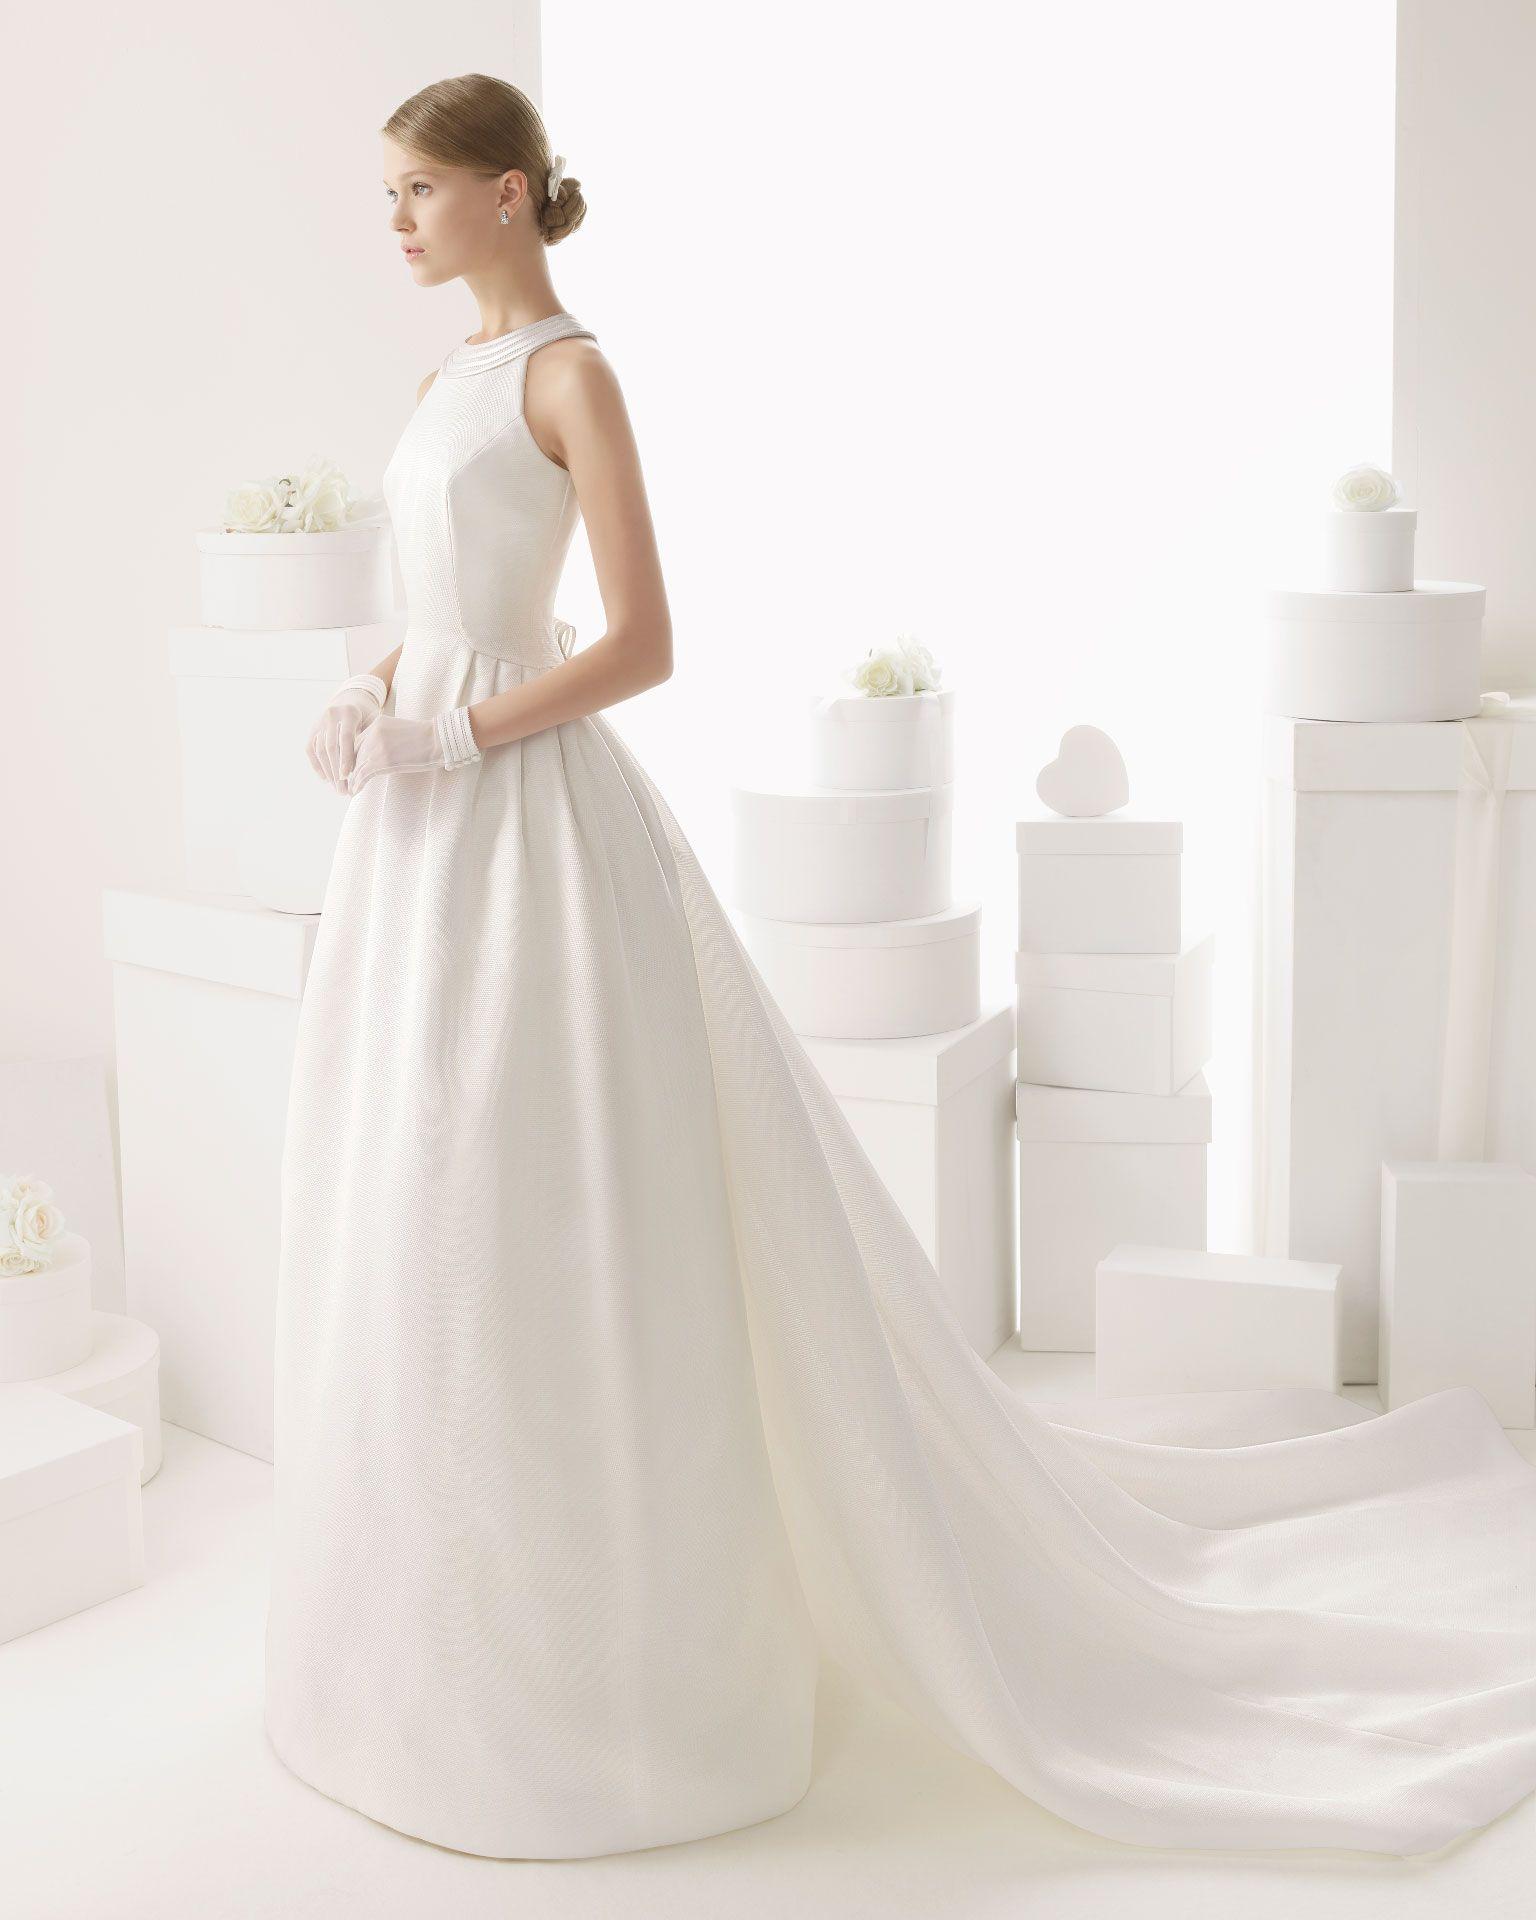 CAUDAL   Silk gazar dress and train with hemstitch detailing, in a ...